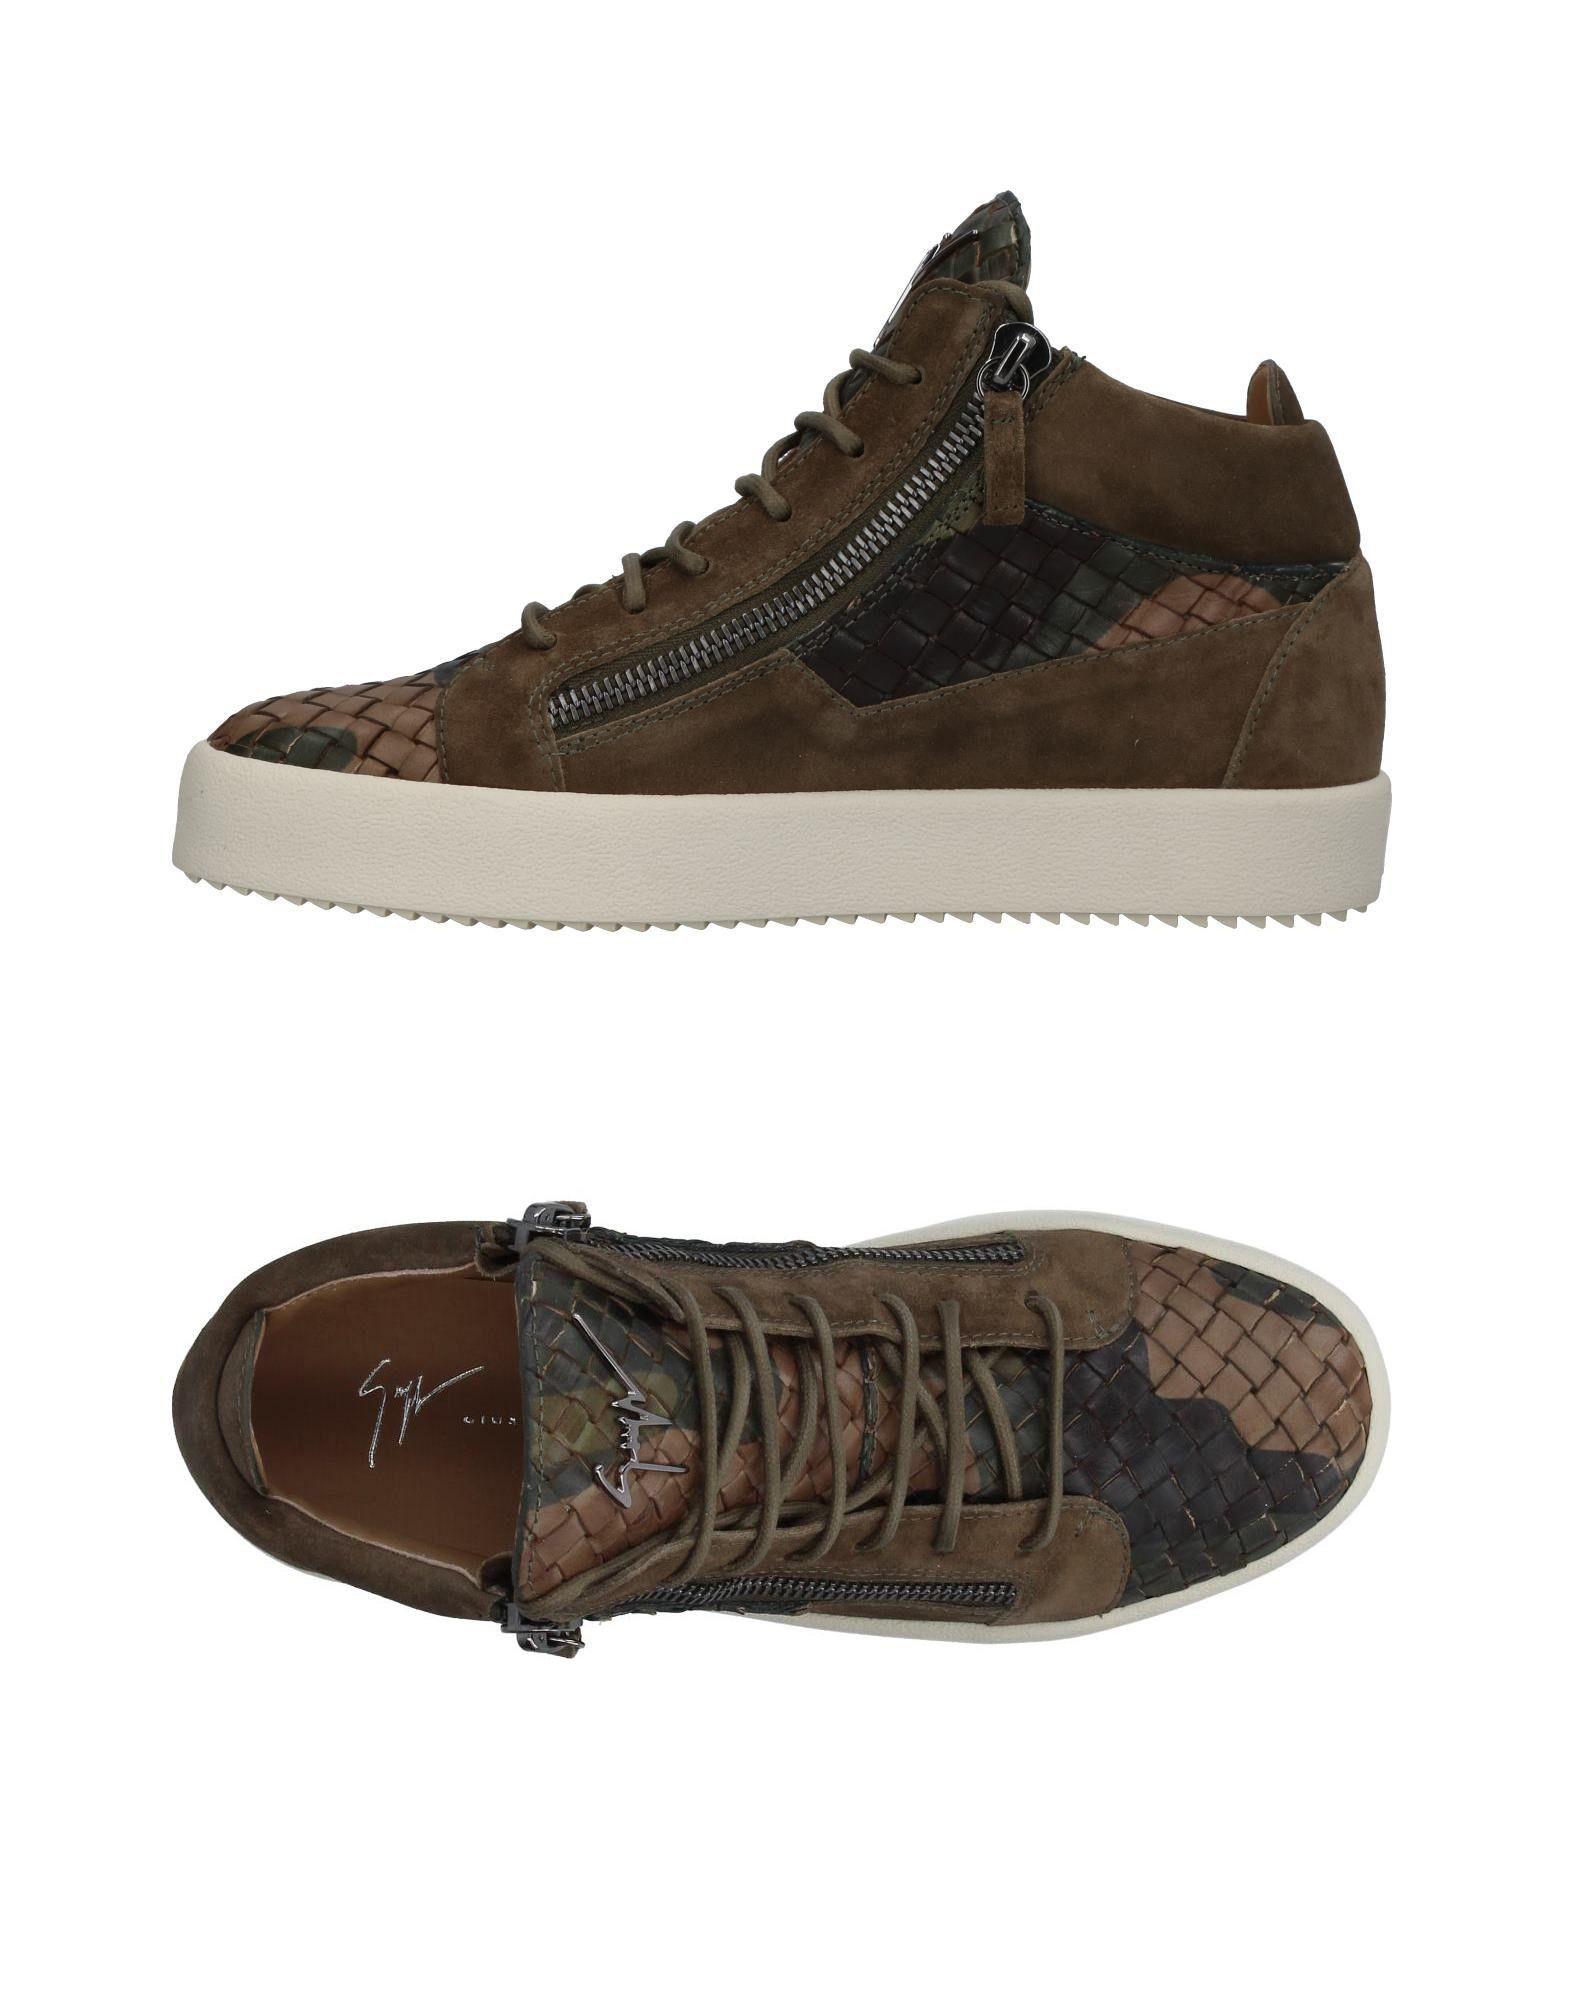 Giuseppe Zanotti Sneakers Herren  11397376AF Gute Qualität beliebte Schuhe